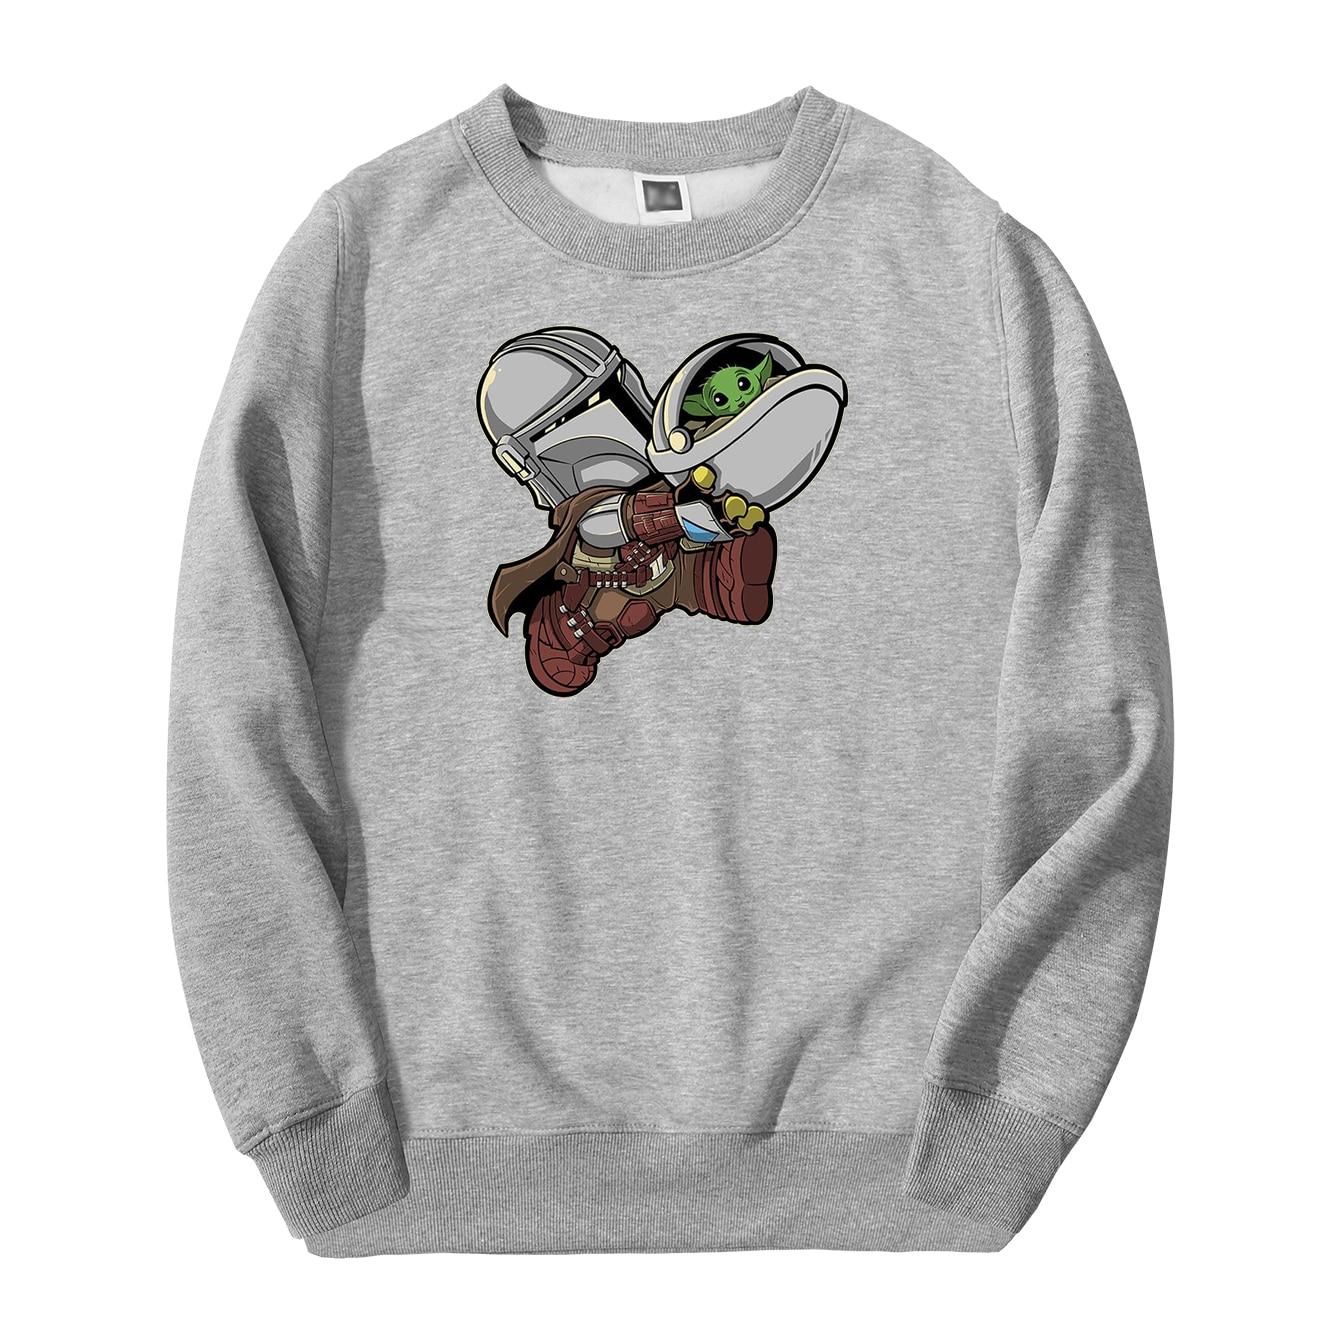 The Mandalorian Star Wars Men Sweatshirt Hoodies 2020 Spring Autumn Casual Cute Baby Yoda Streetwear Loose Fit Fashoin Pullover